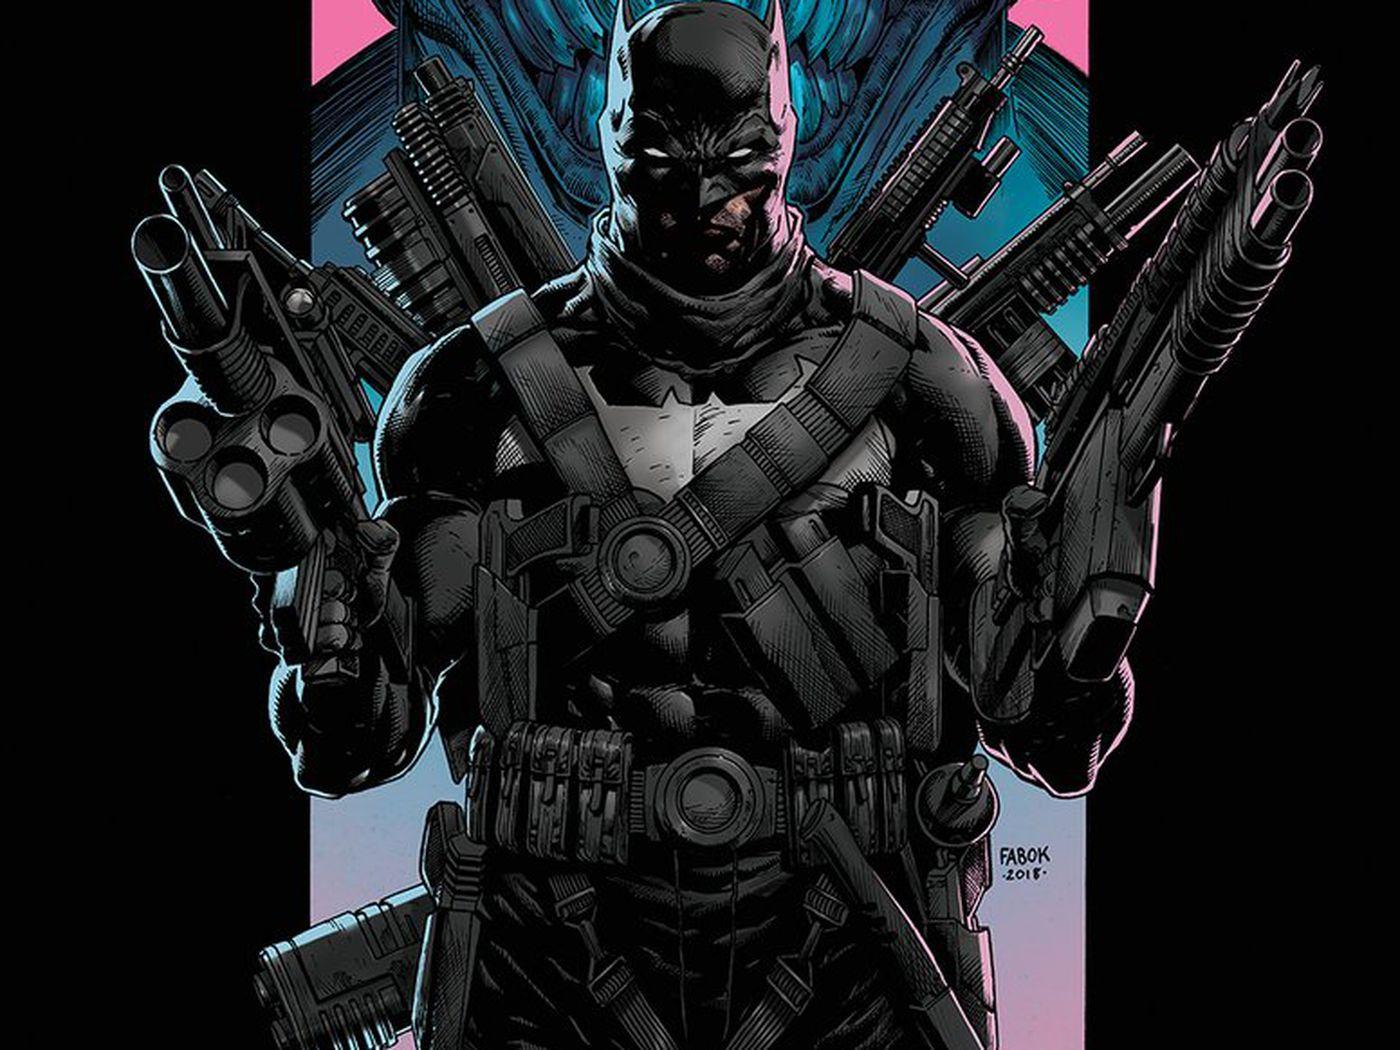 Dc Comics Reveals The Origin Story Of Its New Punisher Batman